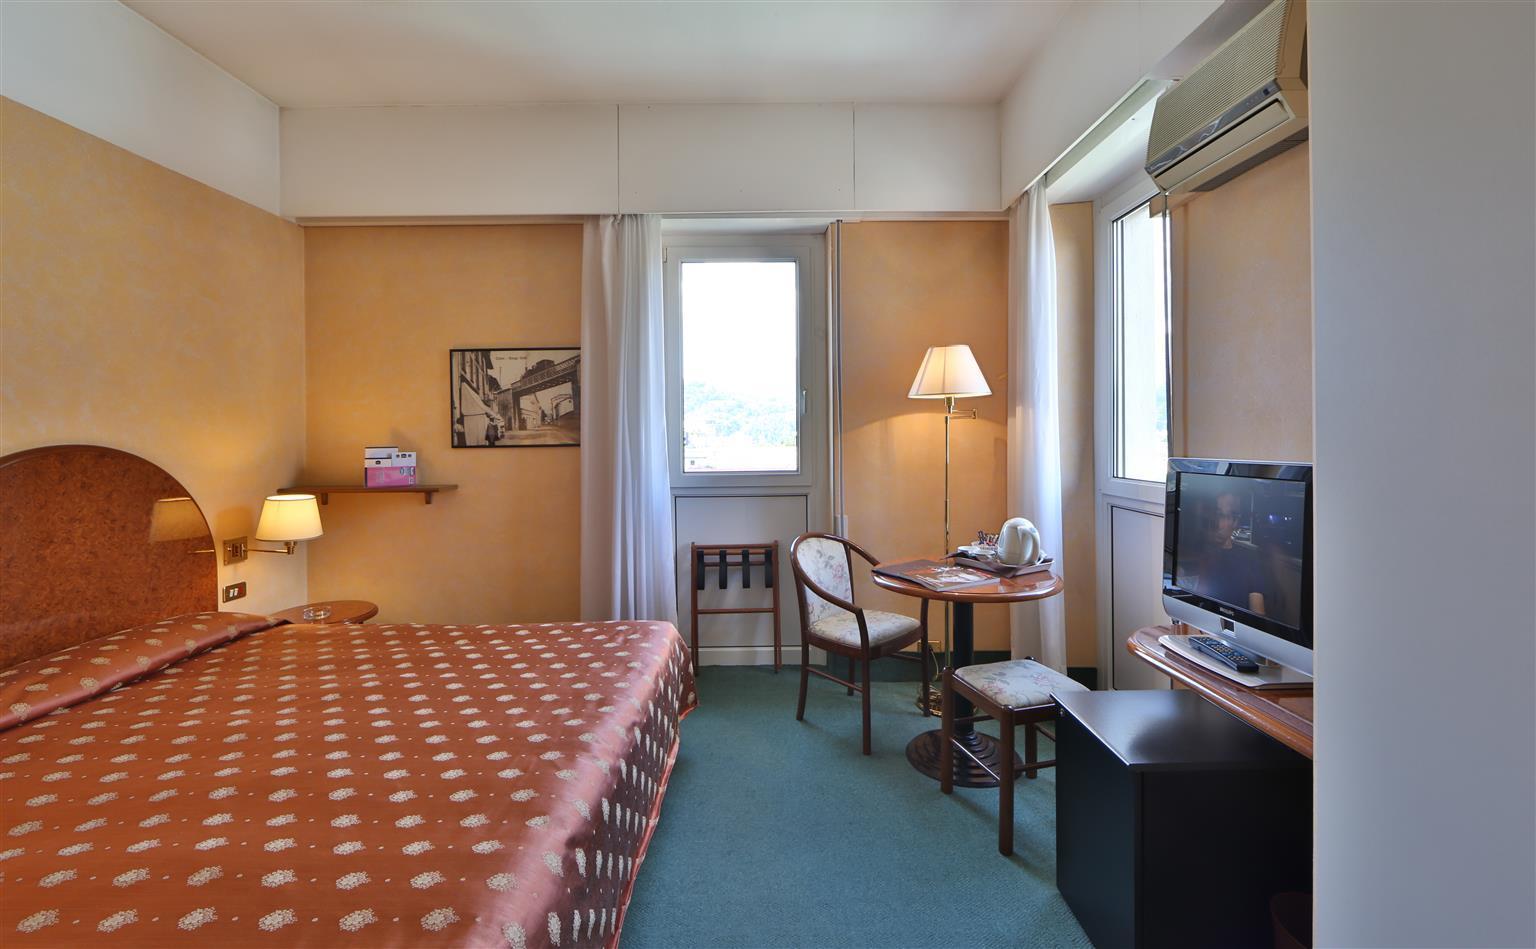 http://extranet.jetlinetravel.info/express-images/express-Best-Western-Hotel-Continental-Lake%20Como%20%282%29.JPEG